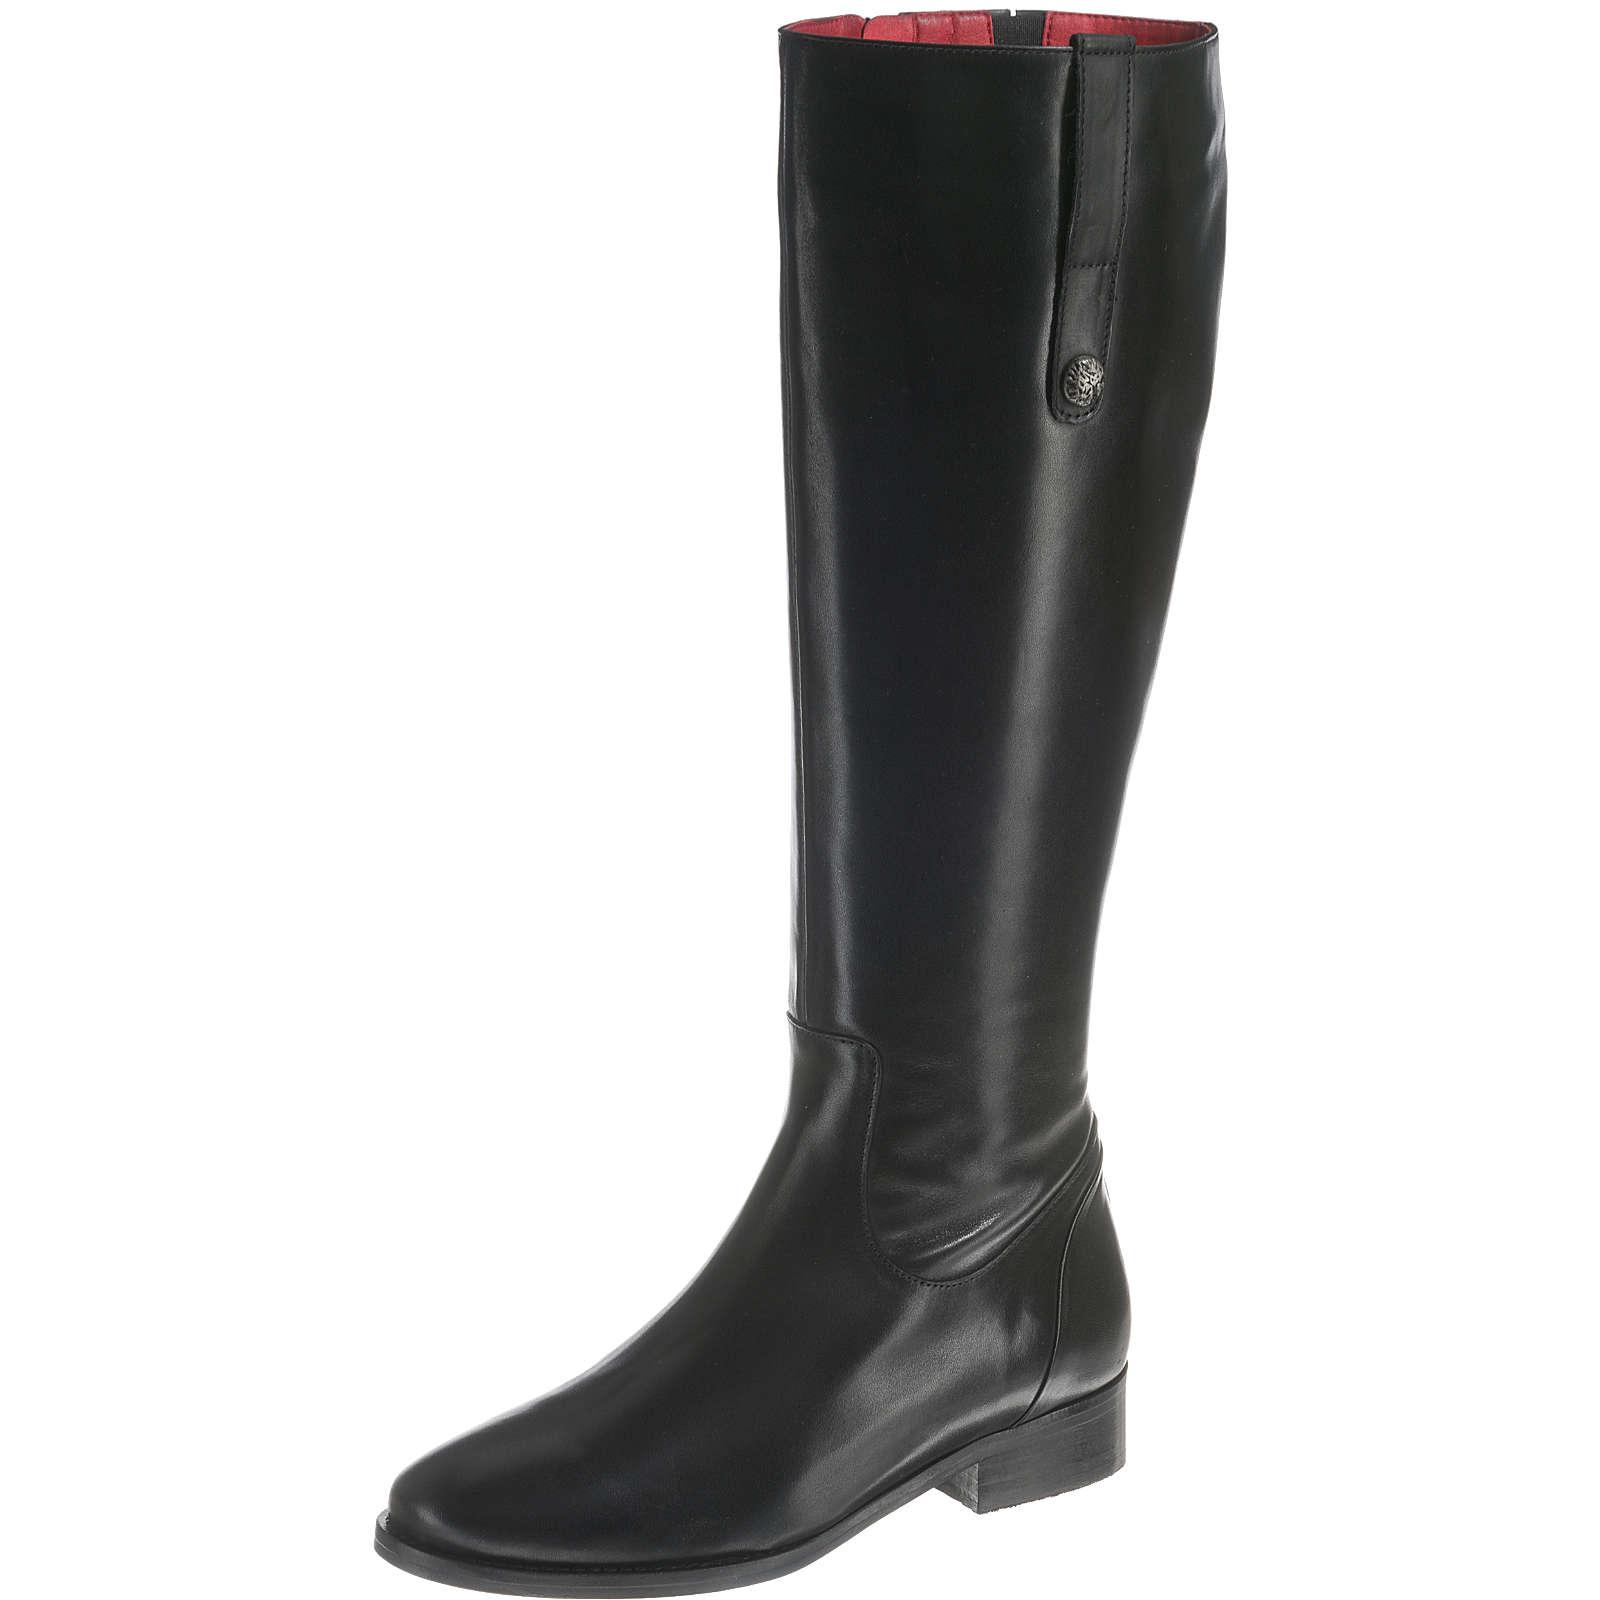 BUFFALO Klassische Stiefel schwarz Damen Gr. 37